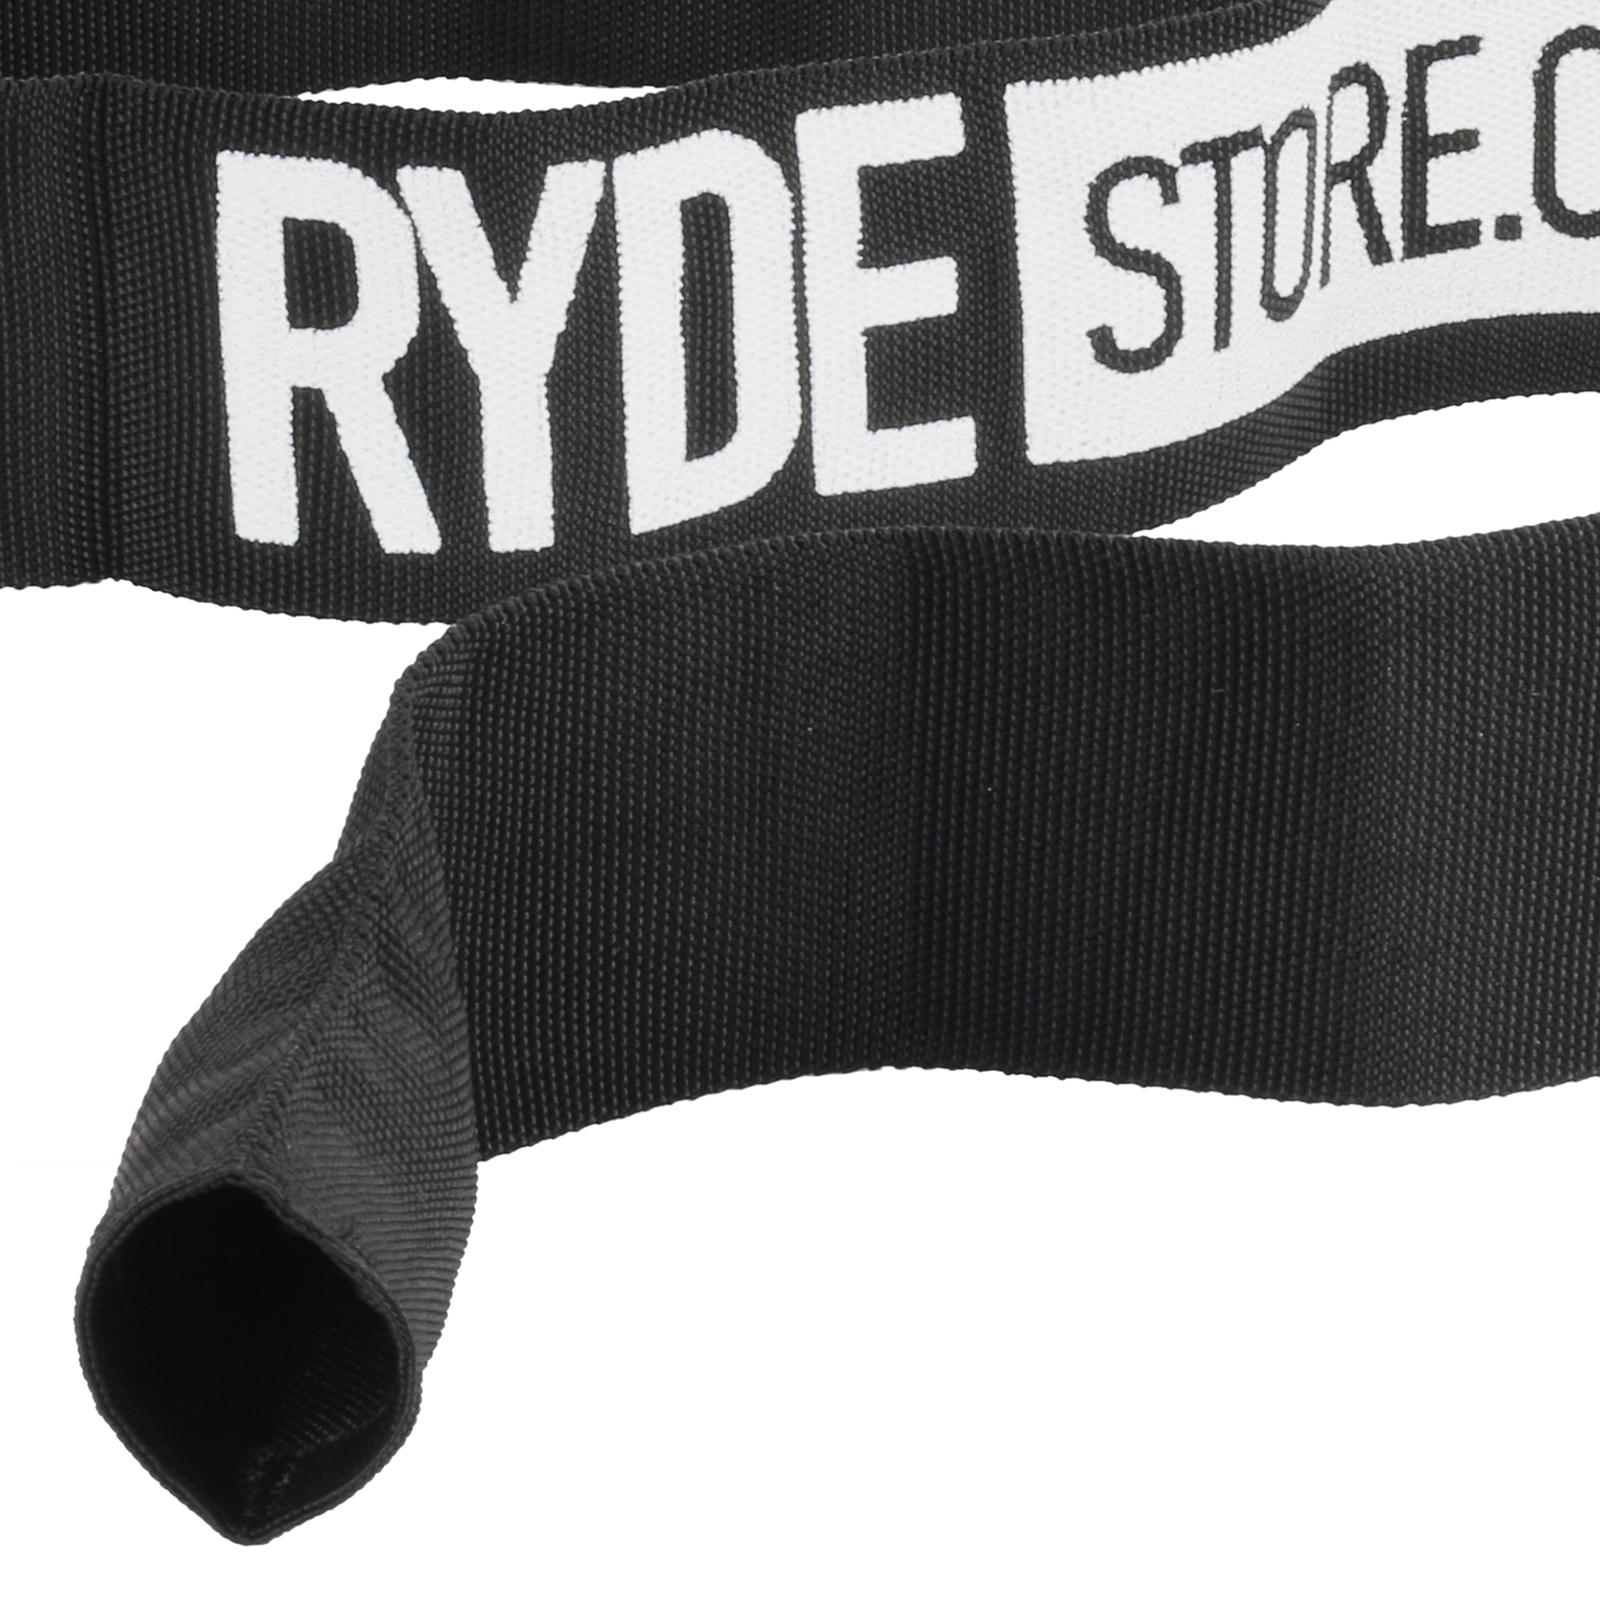 Ryde Chain Lock Sheath Bike Cycle Motorcycle Fabric Sleeve